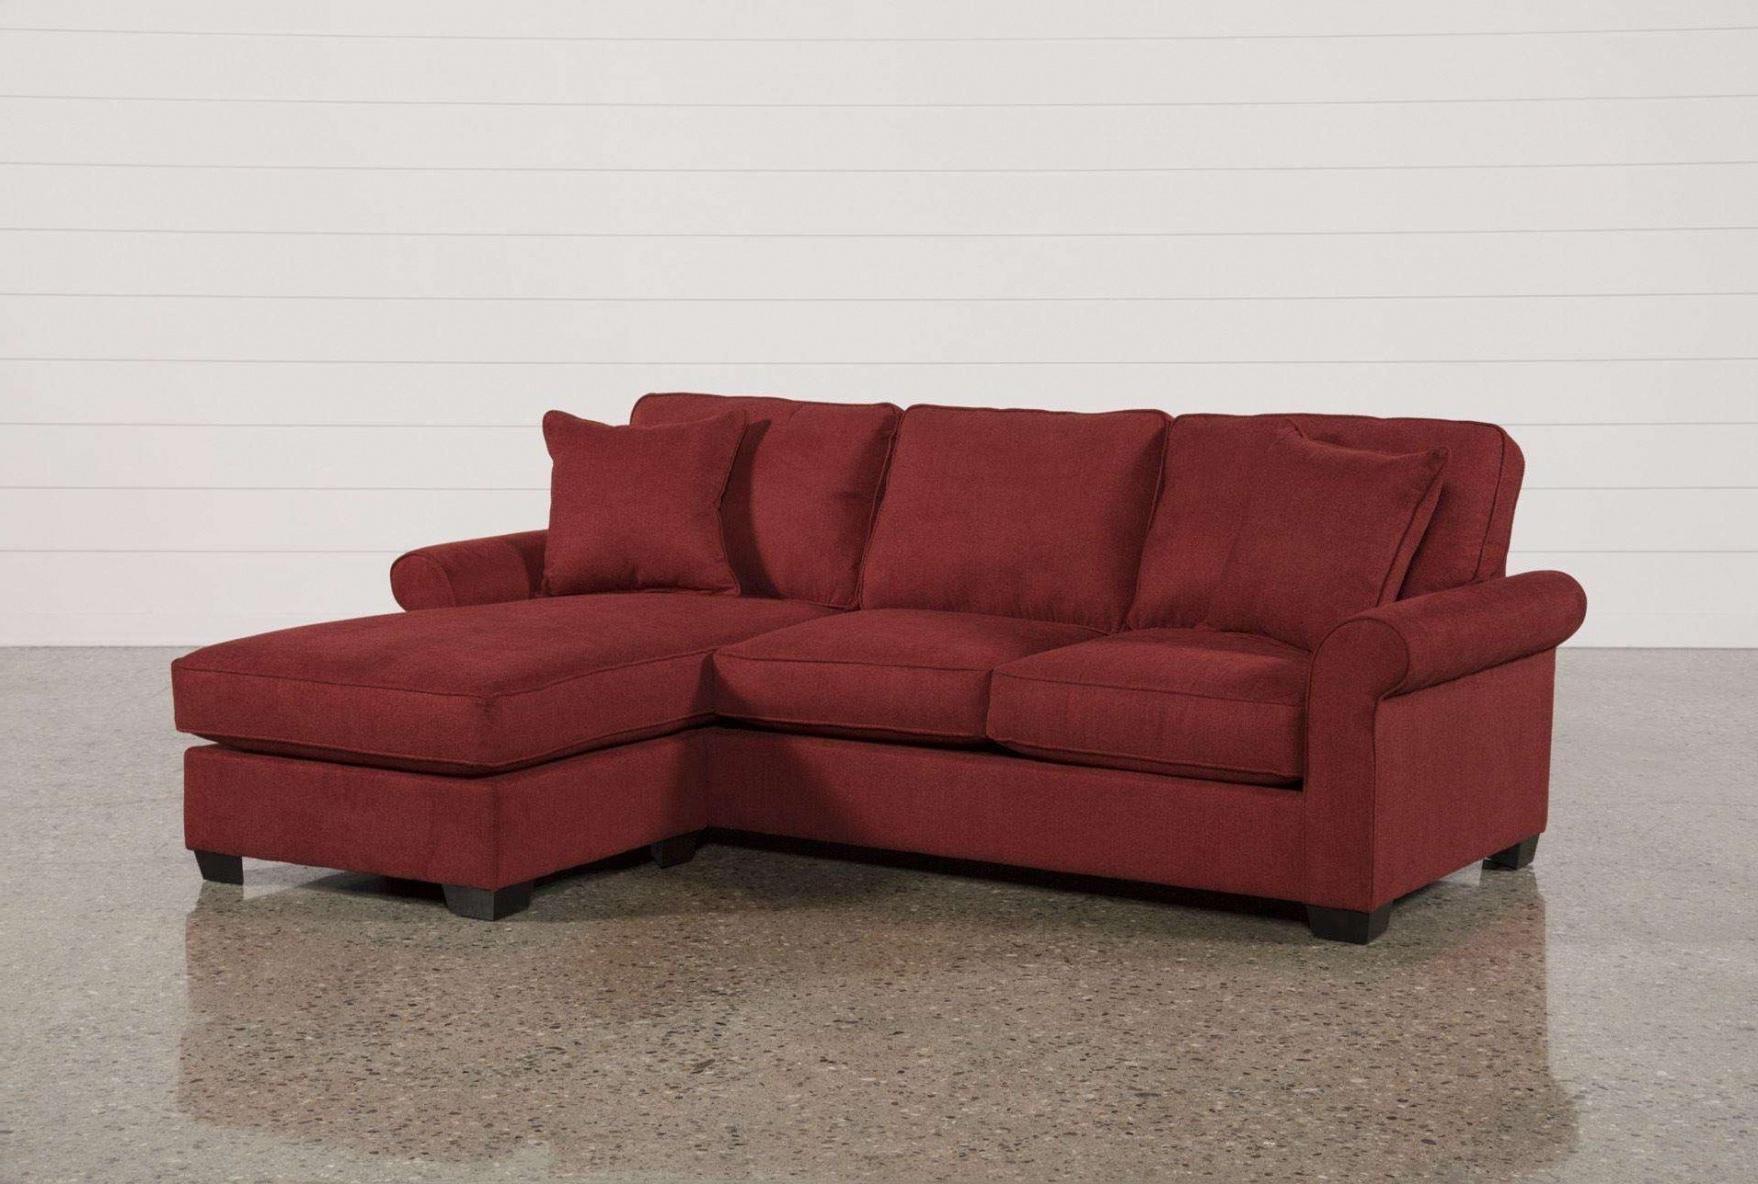 Telas Para sofas Antimanchas Irdz Telas Para sofas Baratas New sofas De Cuero 24 Best sofa De Piel